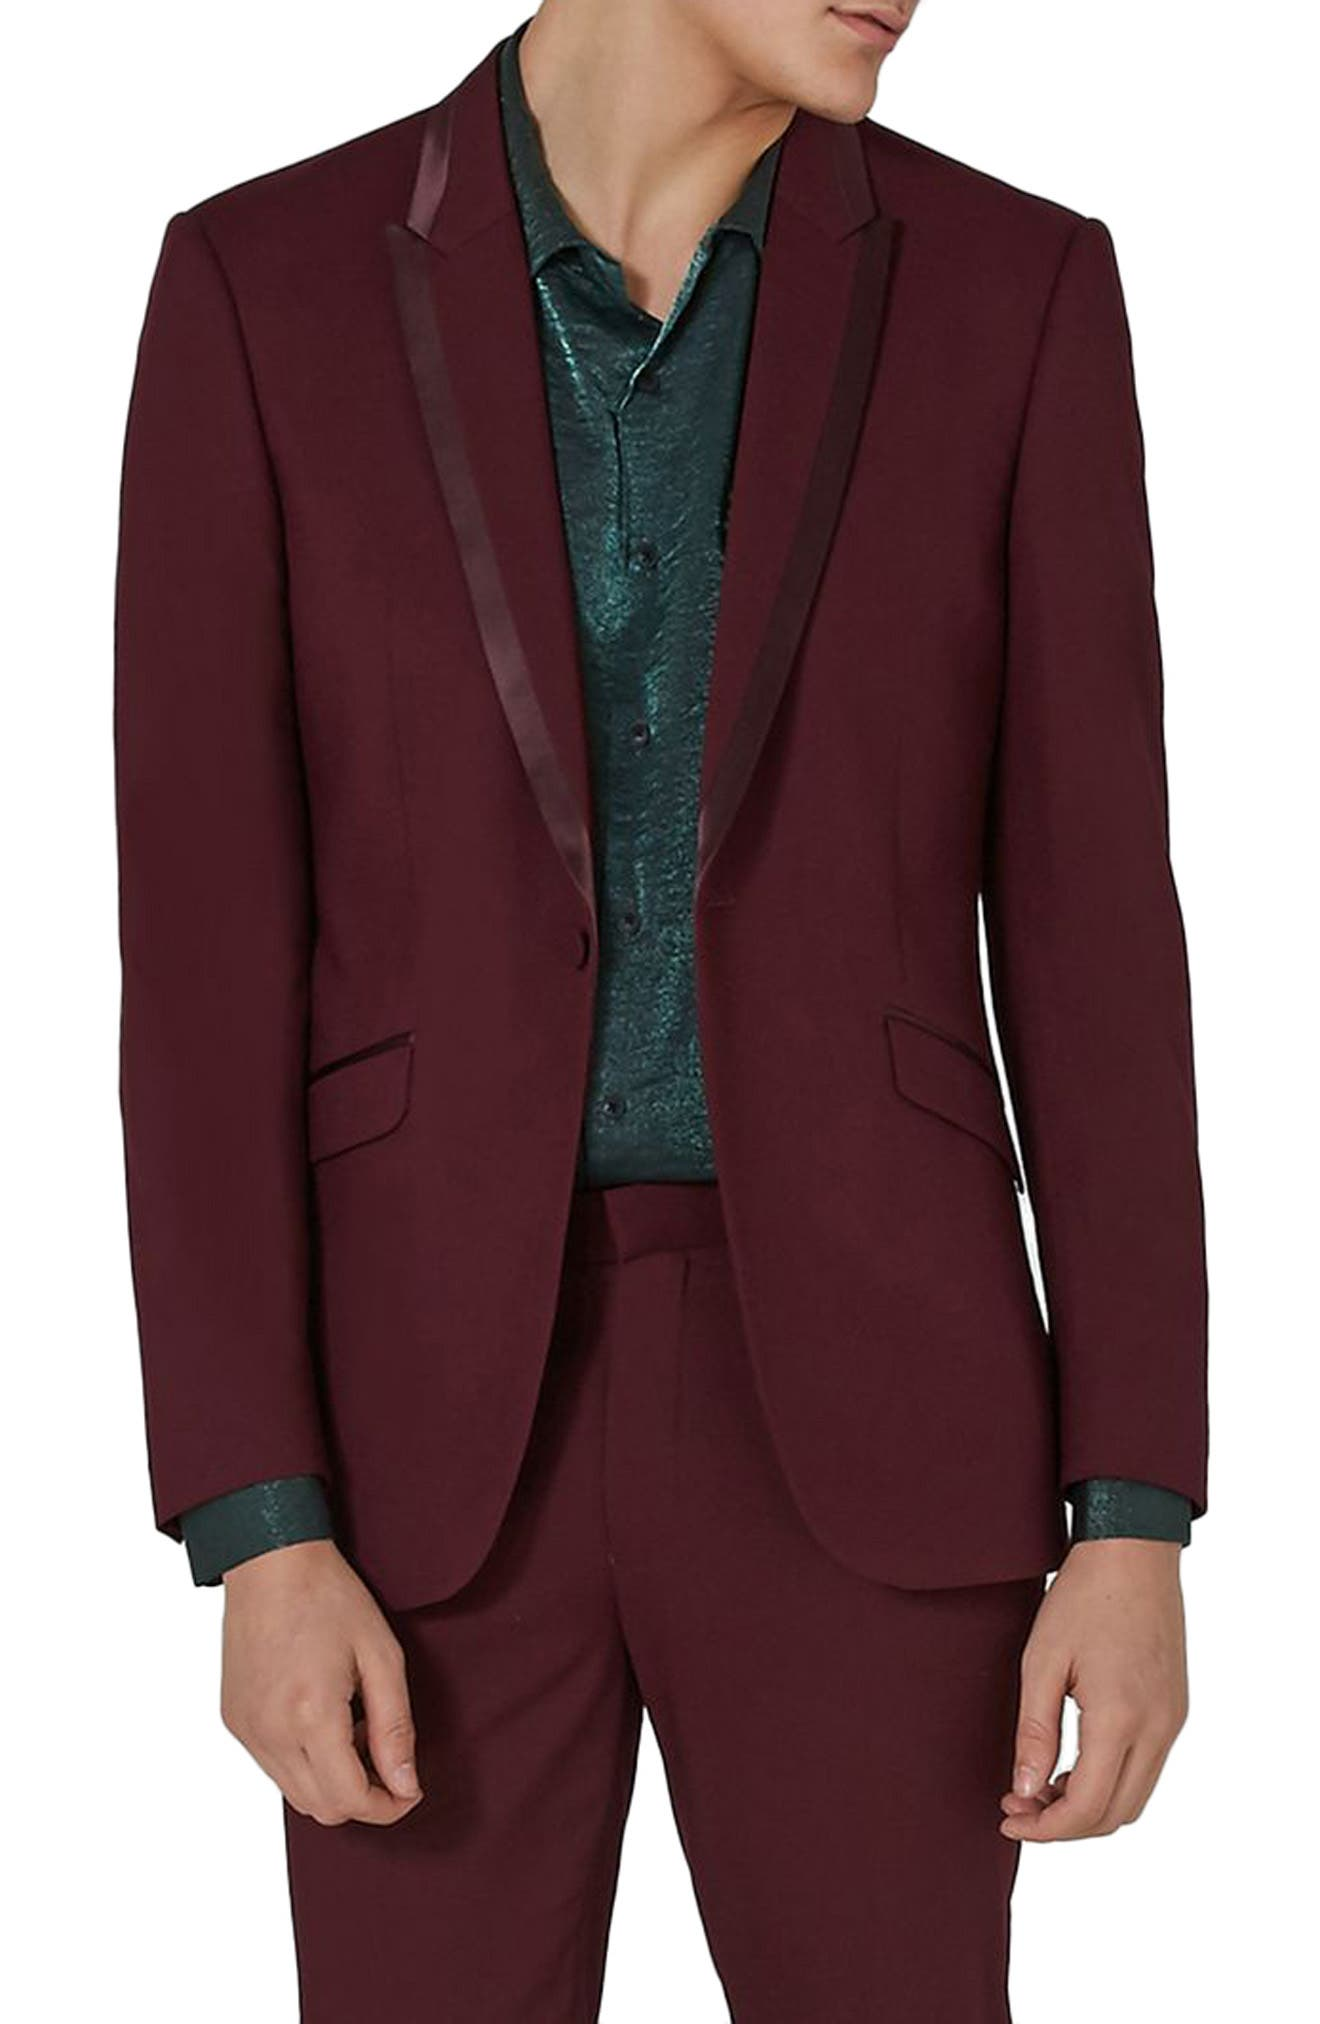 Alternate Image 1 Selected - Topman Skinny Fit Burgundy Tuxedo Jacket